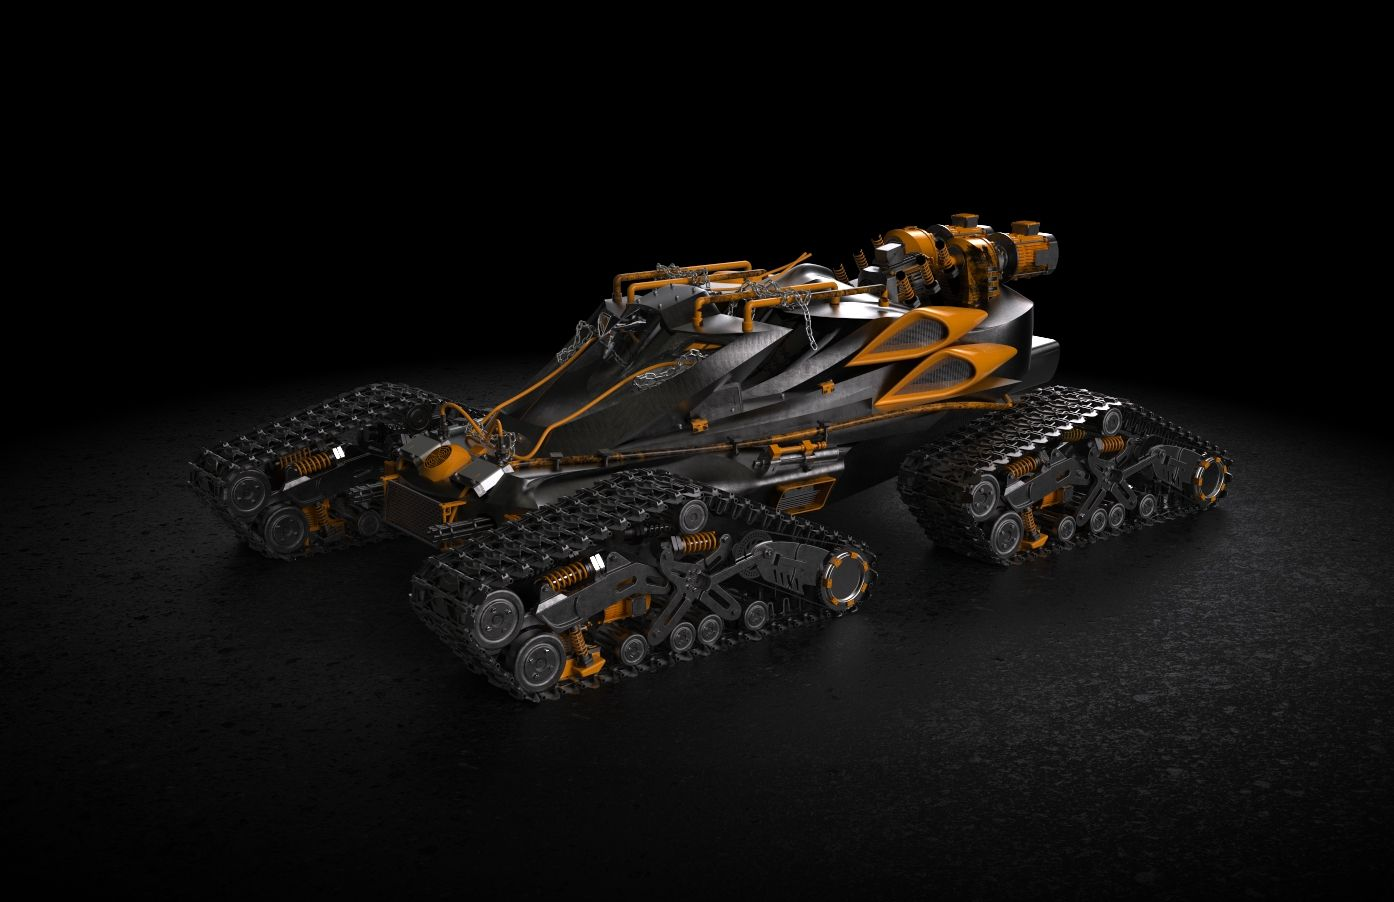 Tank-keyshot-90-3500-3500